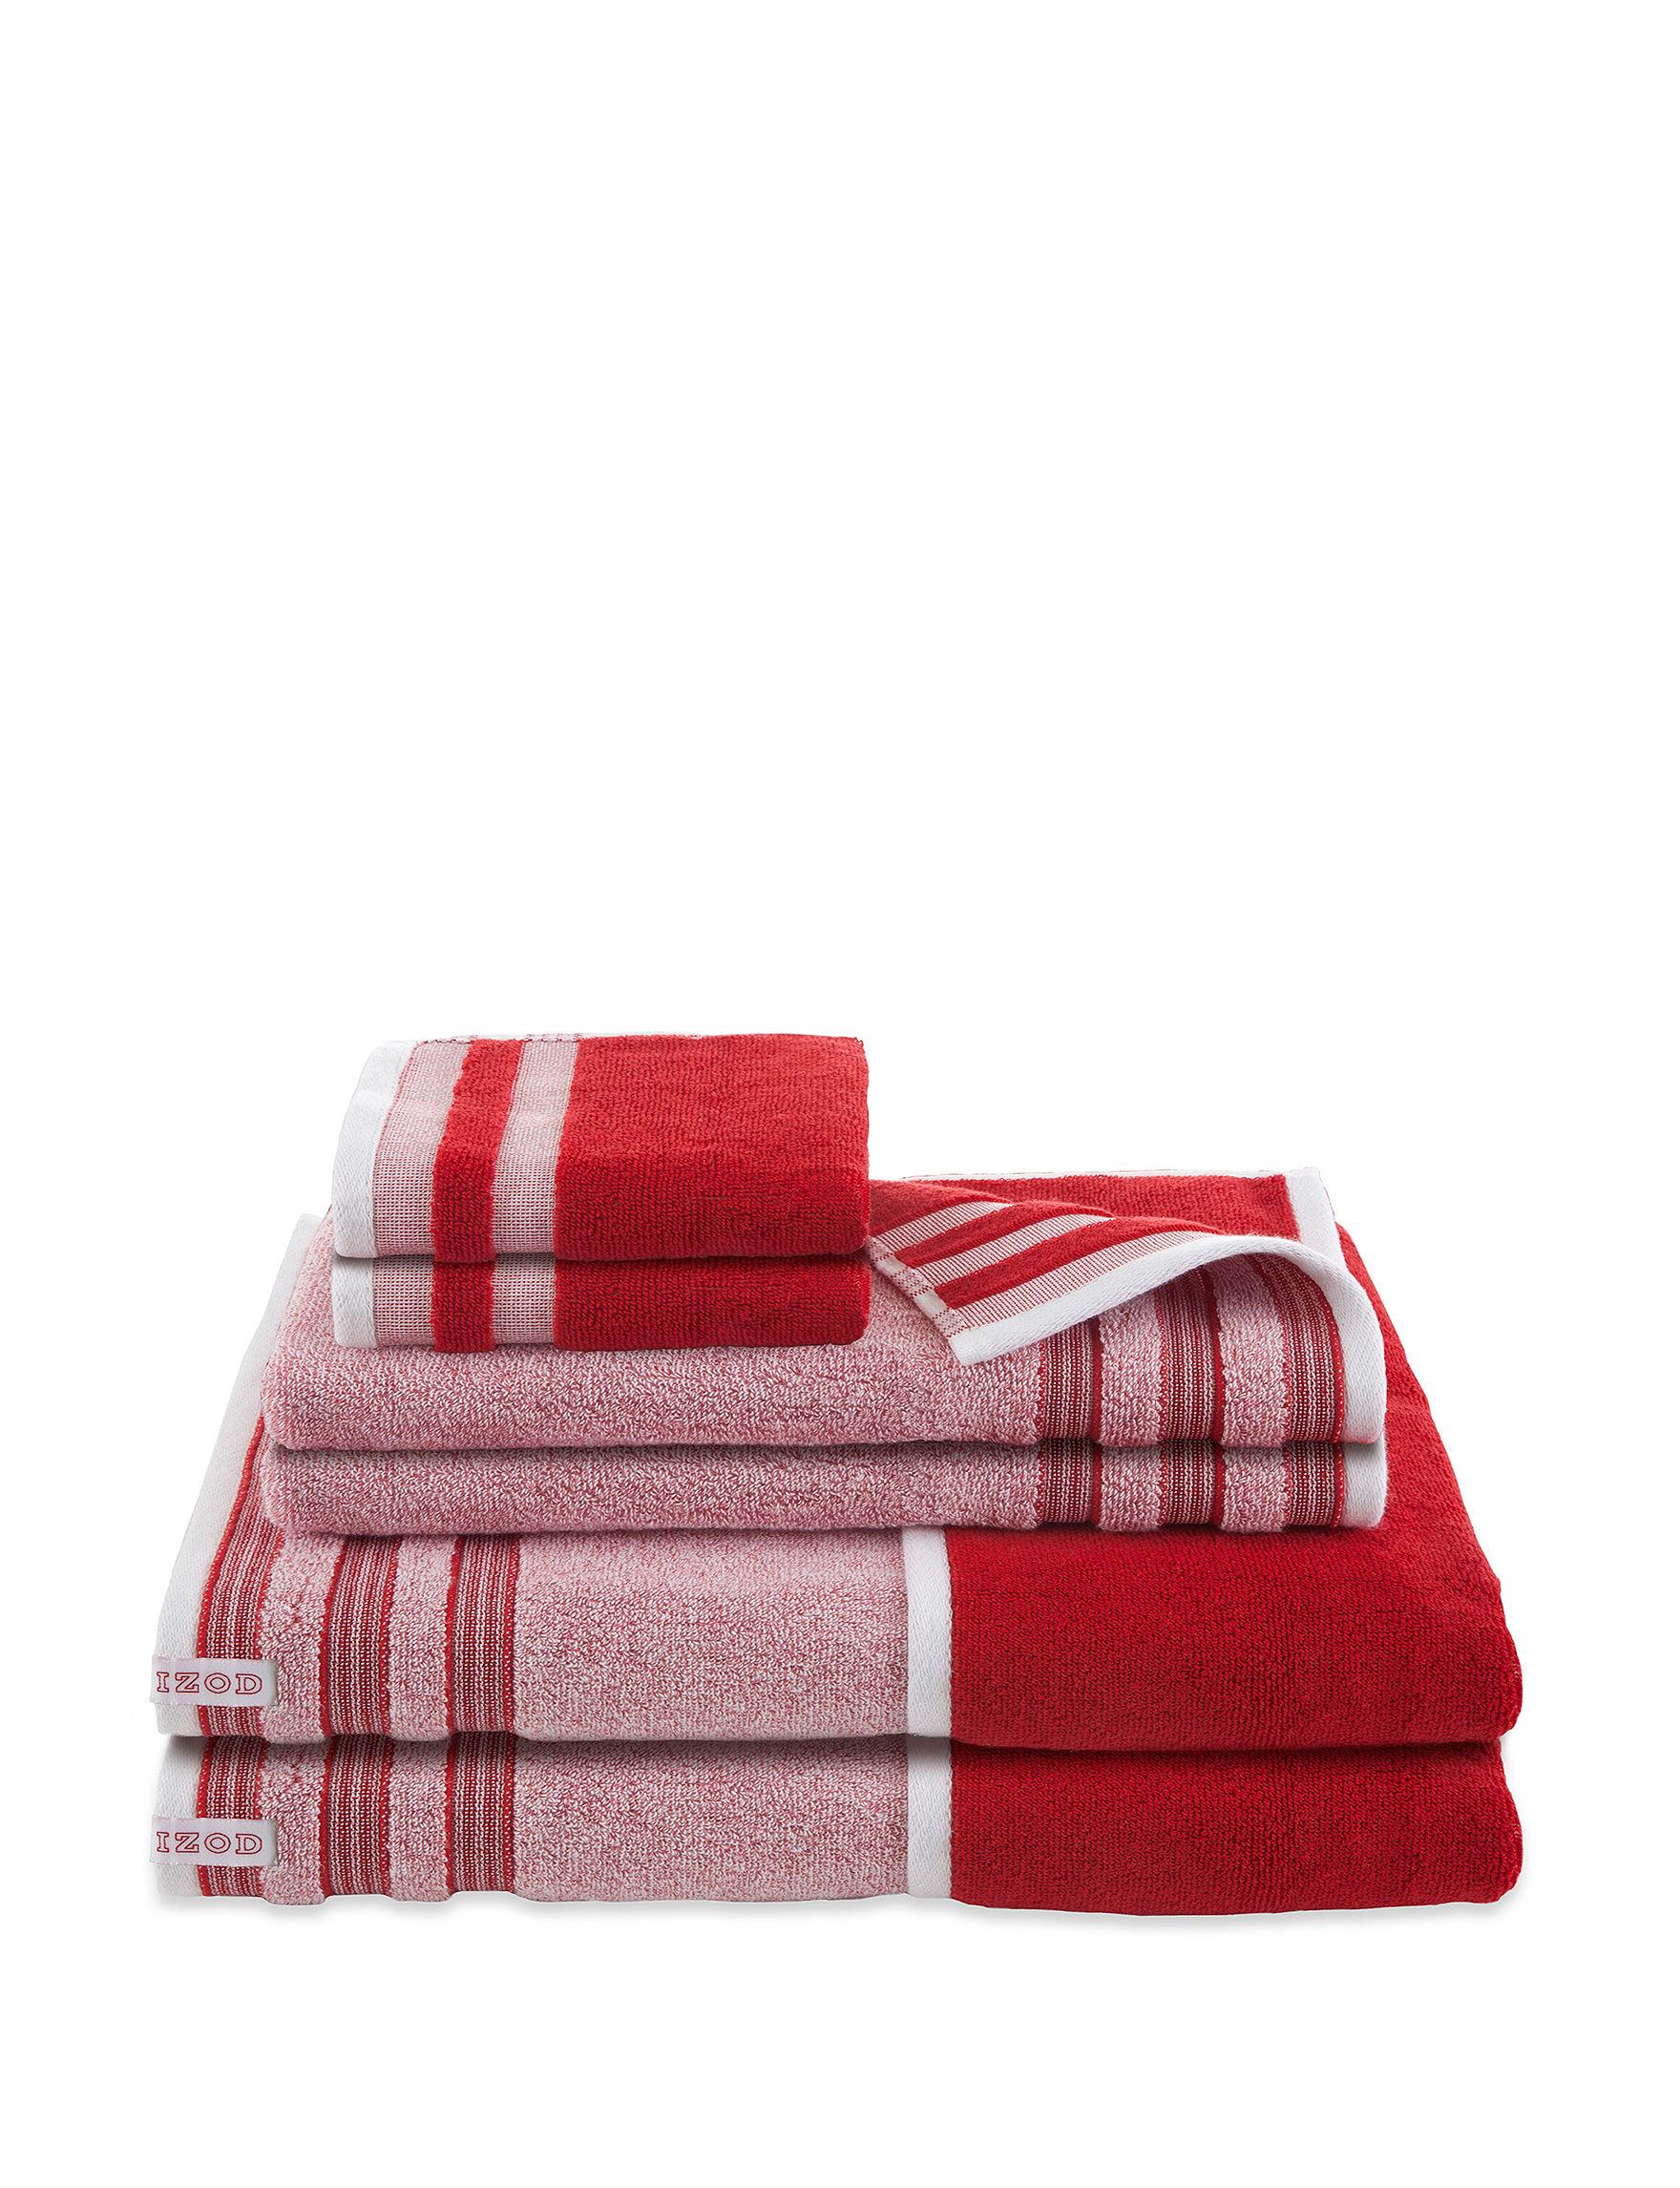 Izod Pompei Red Towel Sets